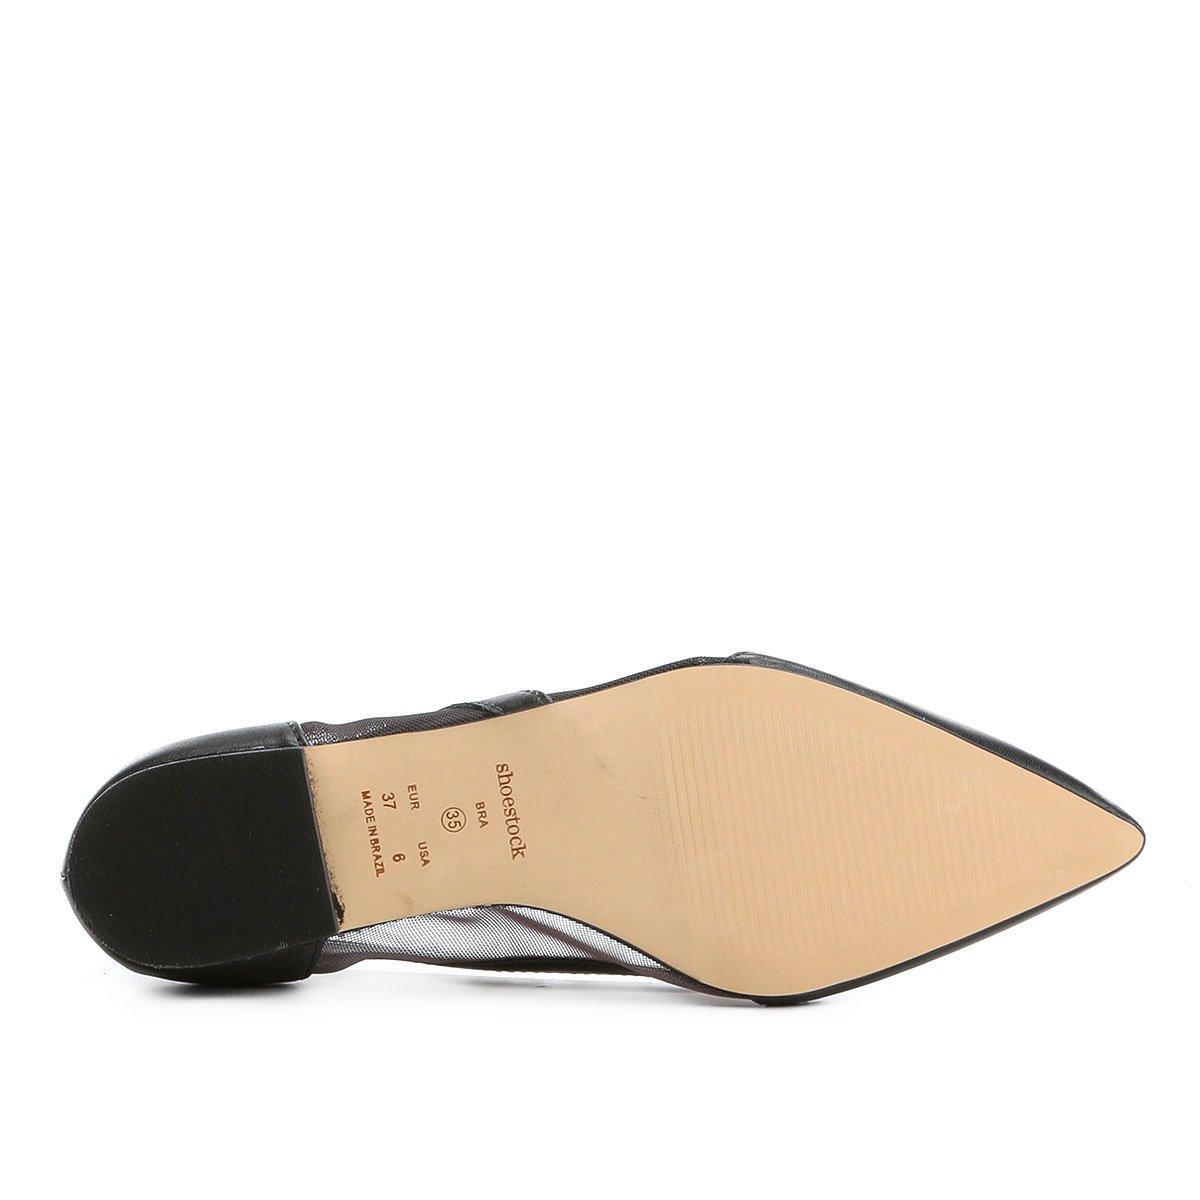 Fino Fino Tela Couro Shoestock Feminina Sapatilha Bico Tela Preto Shoestock Sapatilha Bico Couro zwwA1q